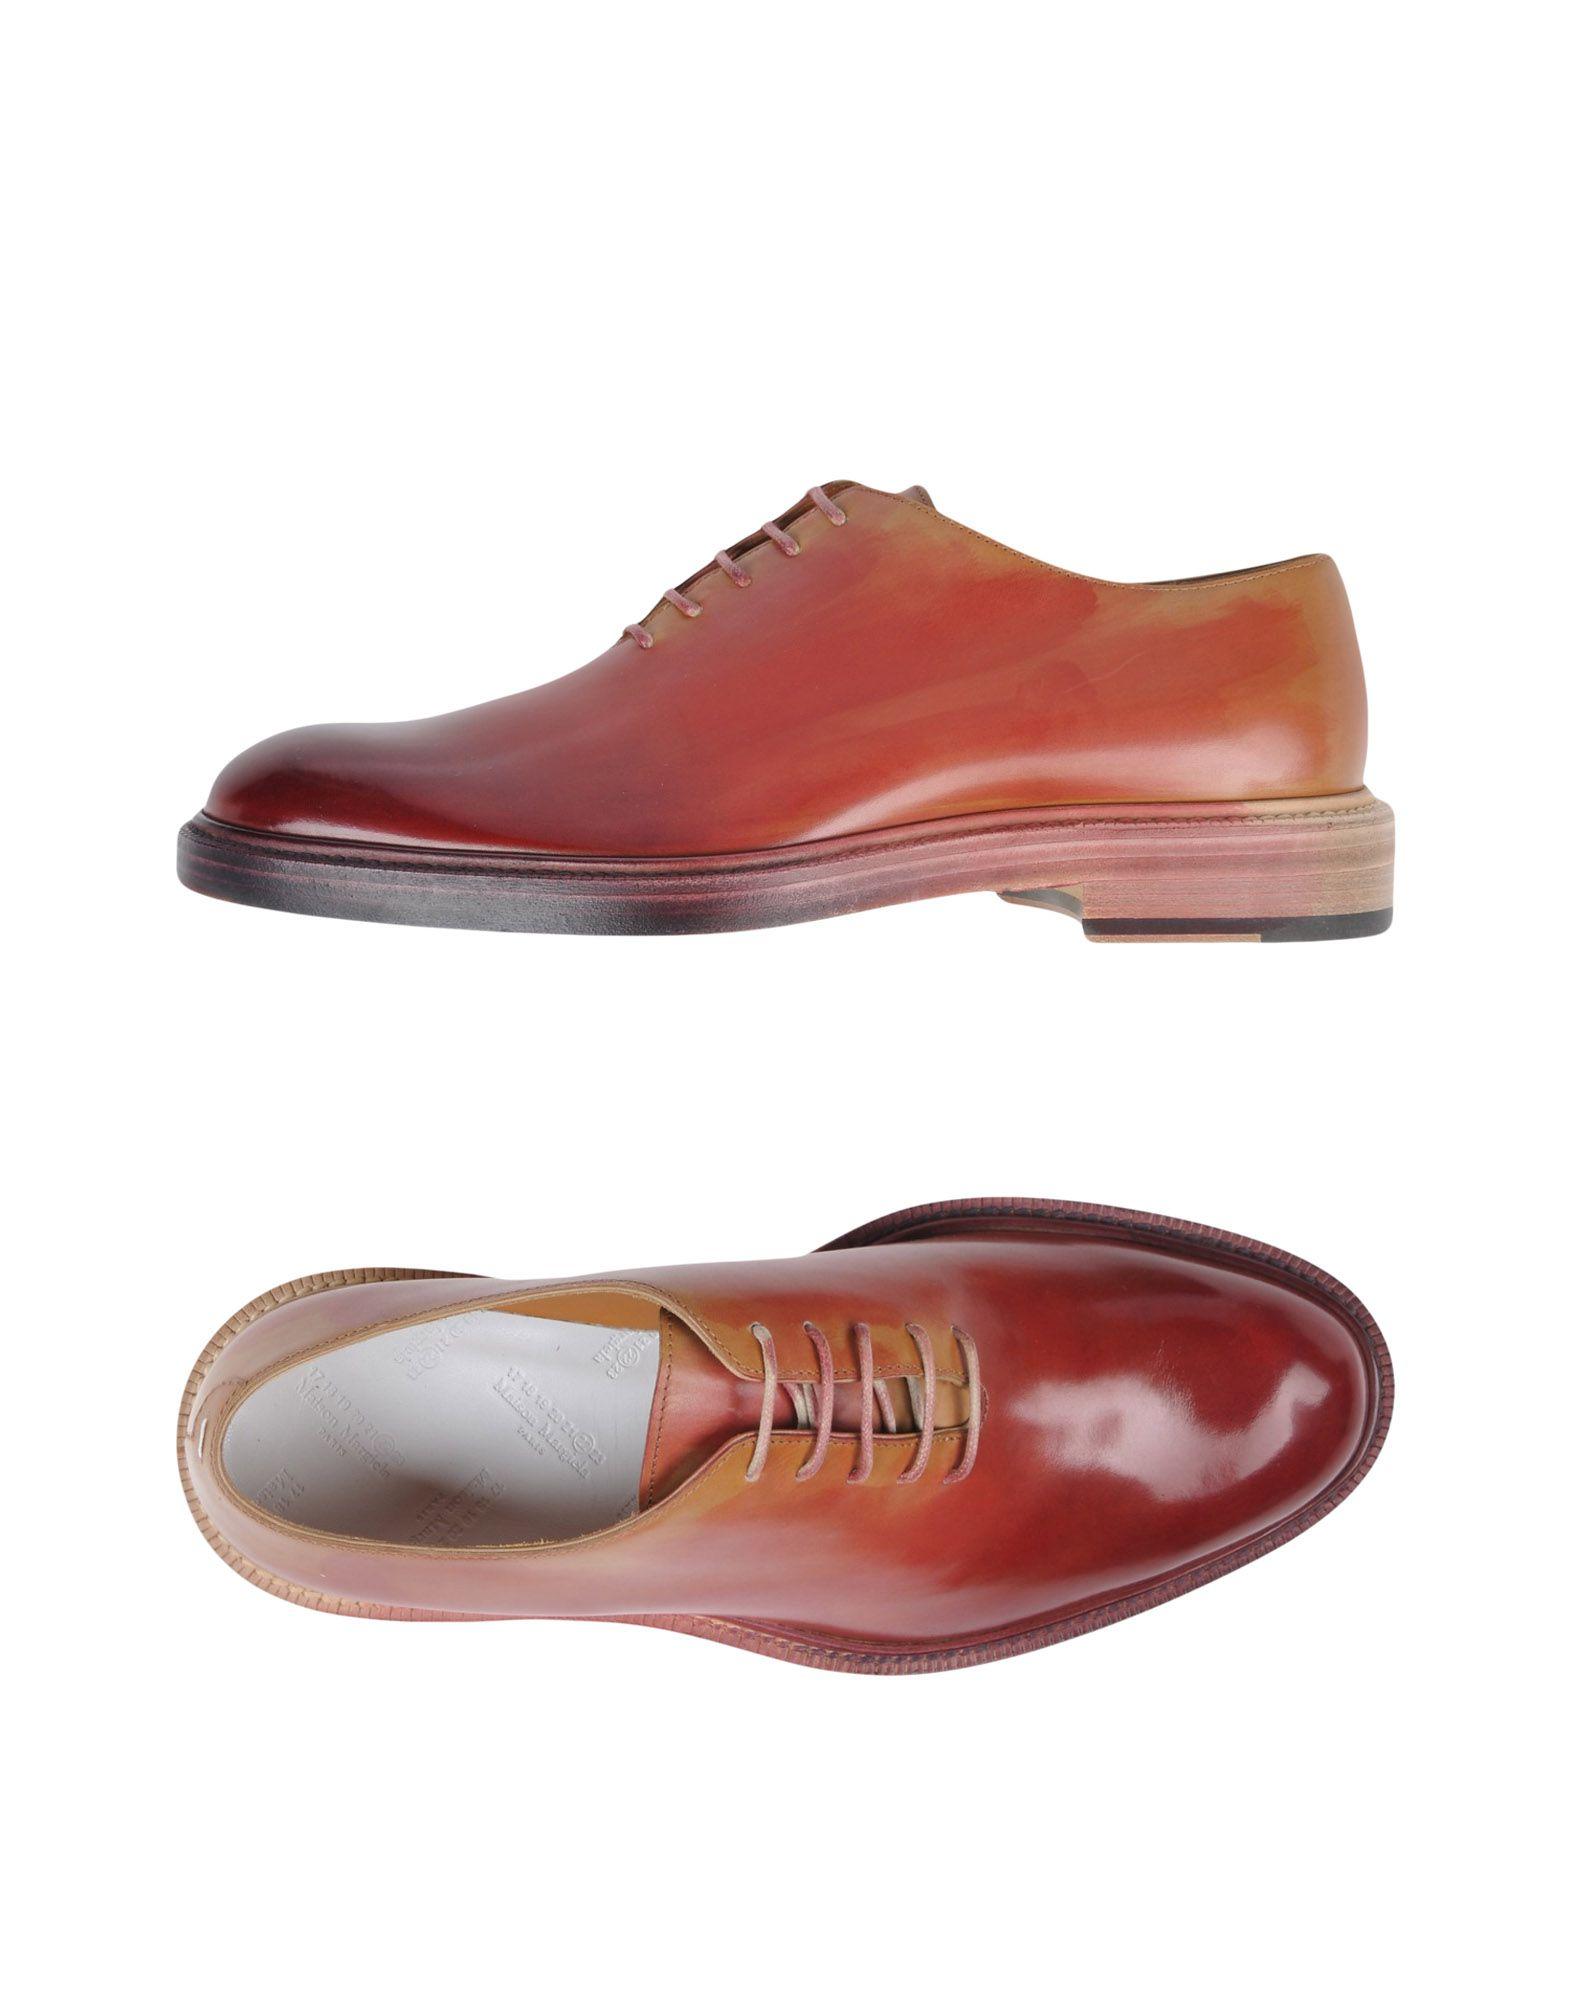 Maison Margiela Schnürschuhe Qualität Herren  11471868TR Gute Qualität Schnürschuhe beliebte Schuhe 4c3d07